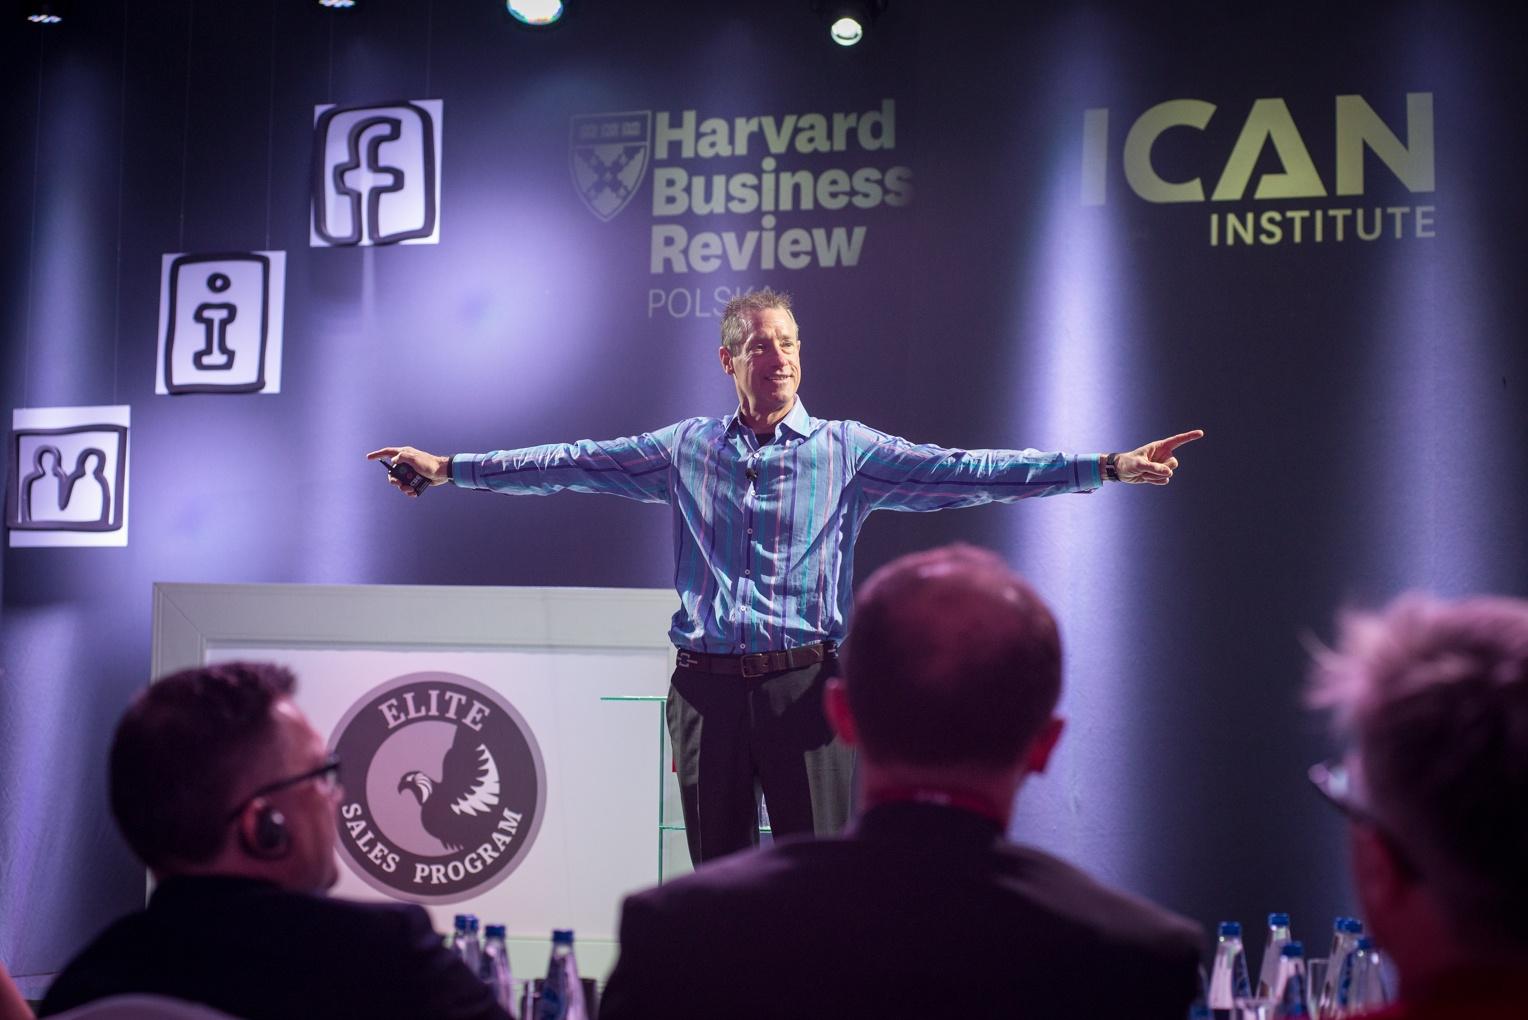 David-Meerman-Scott-Marketing-Speaker-1.jpg